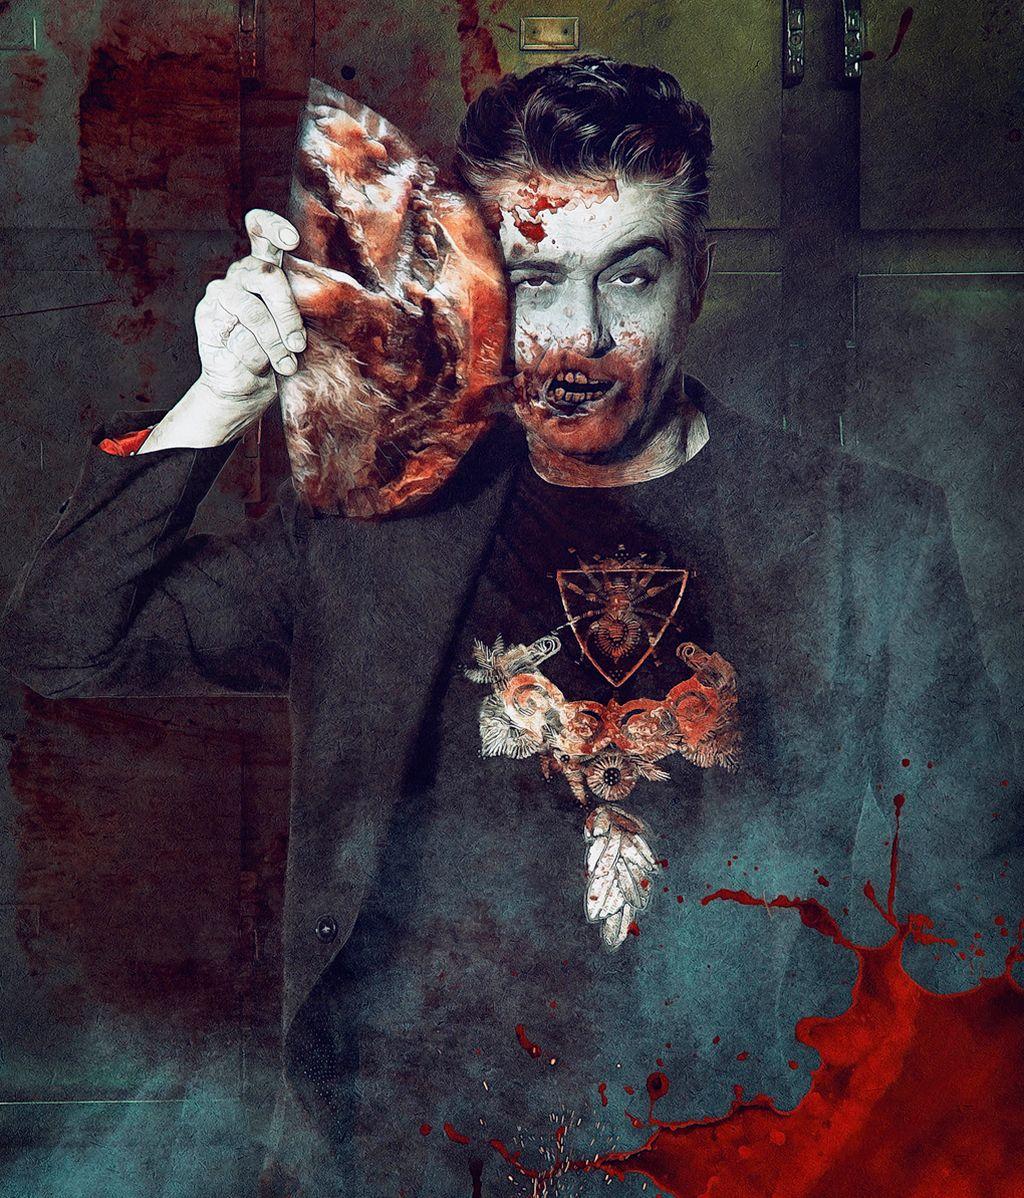 Halloween Llega A Gh Vip 6 Las Fotos Mas Terrorificas De Los - Imagenes-terrorificas-de-halloween